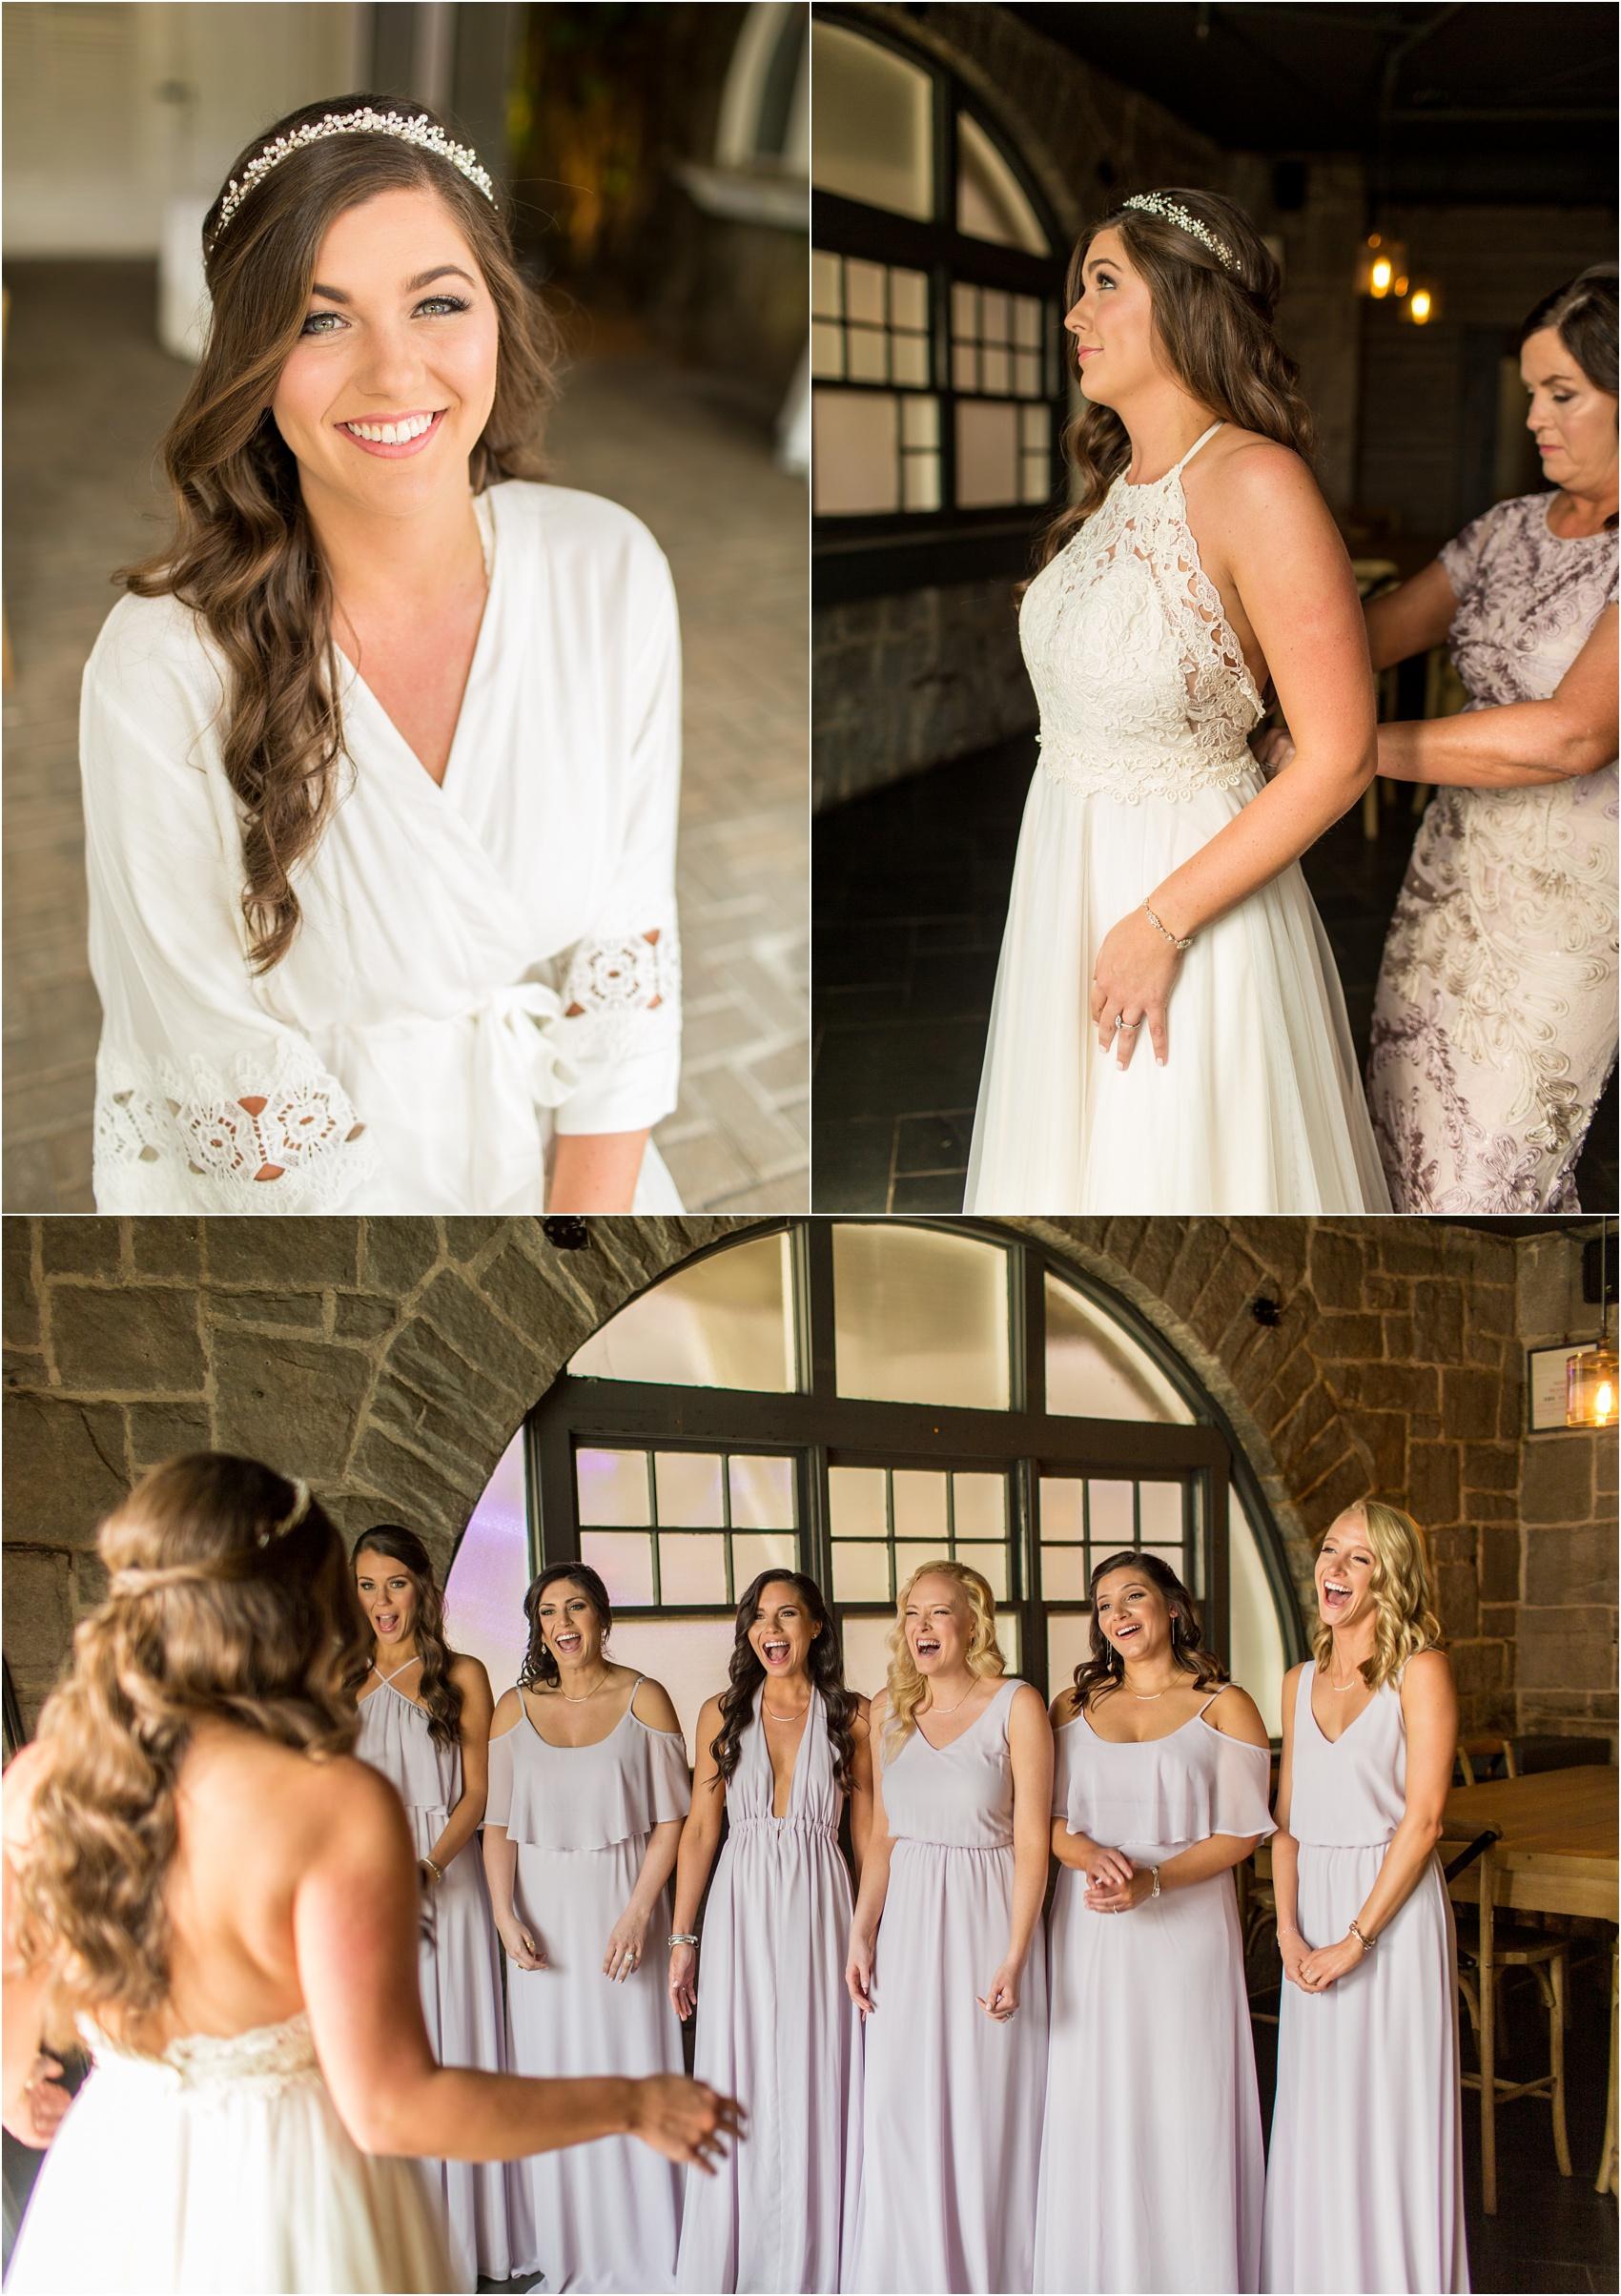 Savannah Eve Photography- Groseclose Wedding- Blog-1.jpg